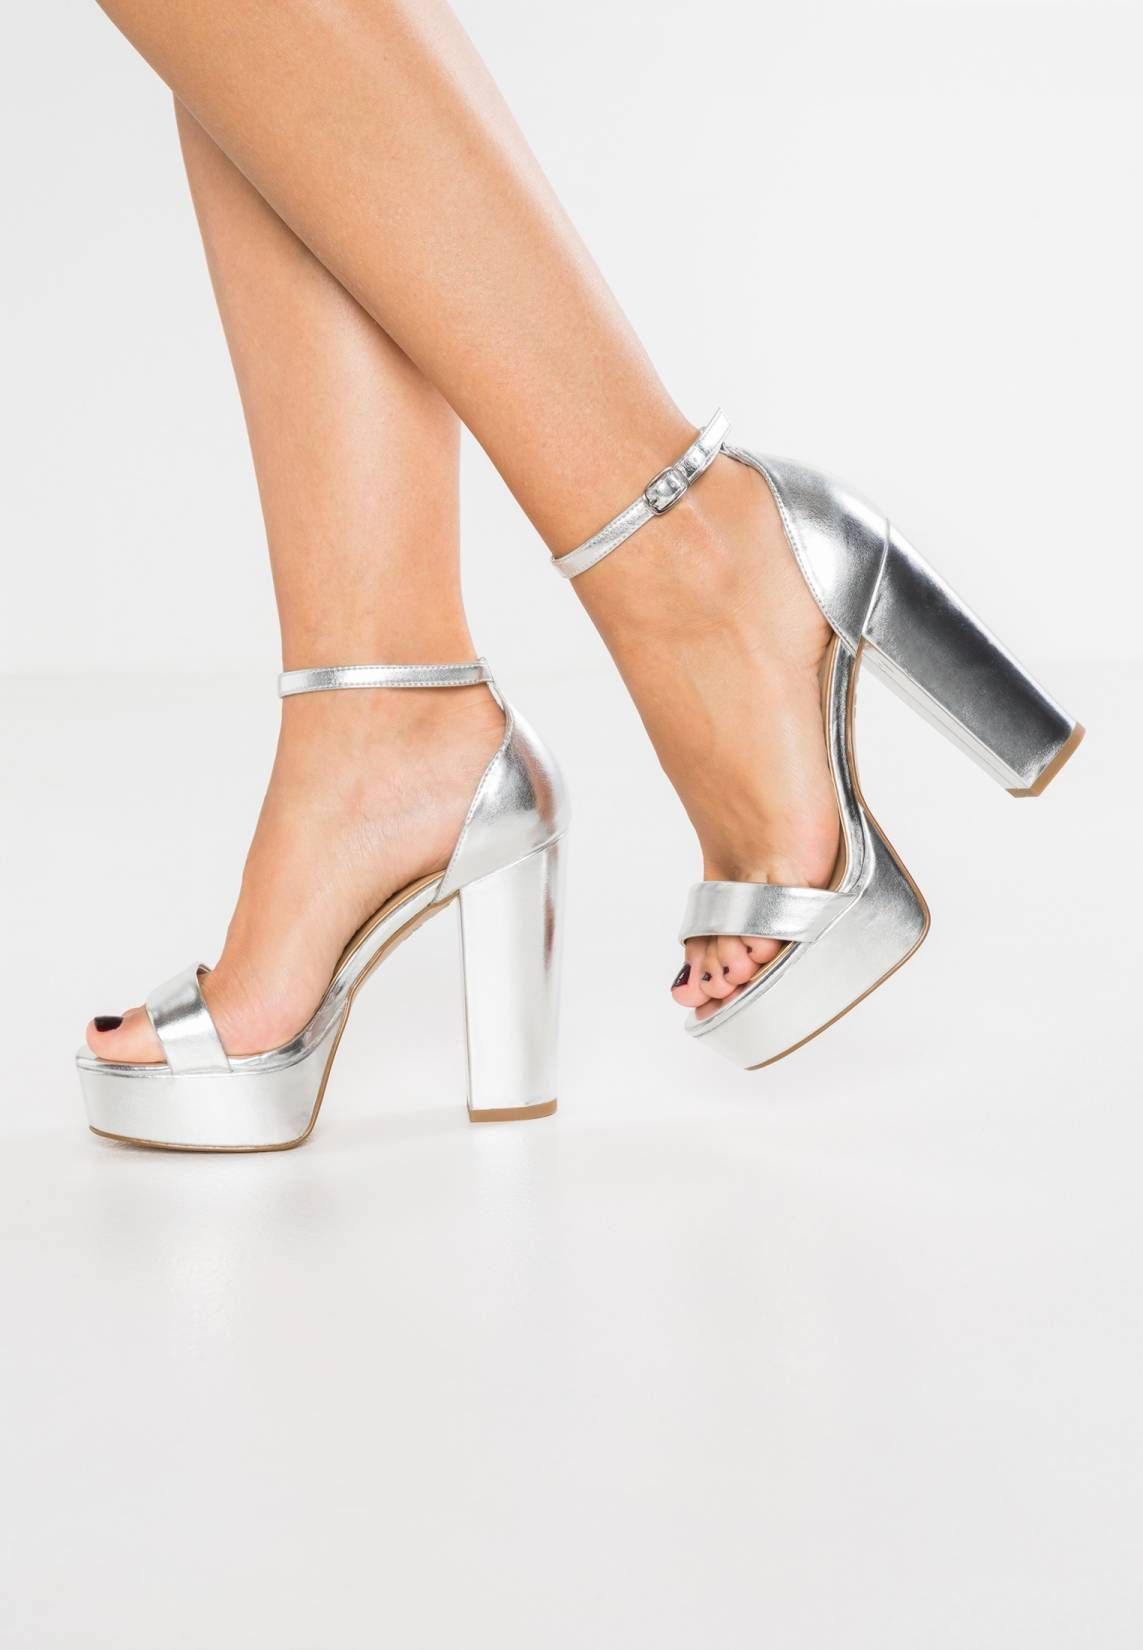 New Look Wide Fit. TESSY 2 - Sandali con i tacchi - silver. Fodera